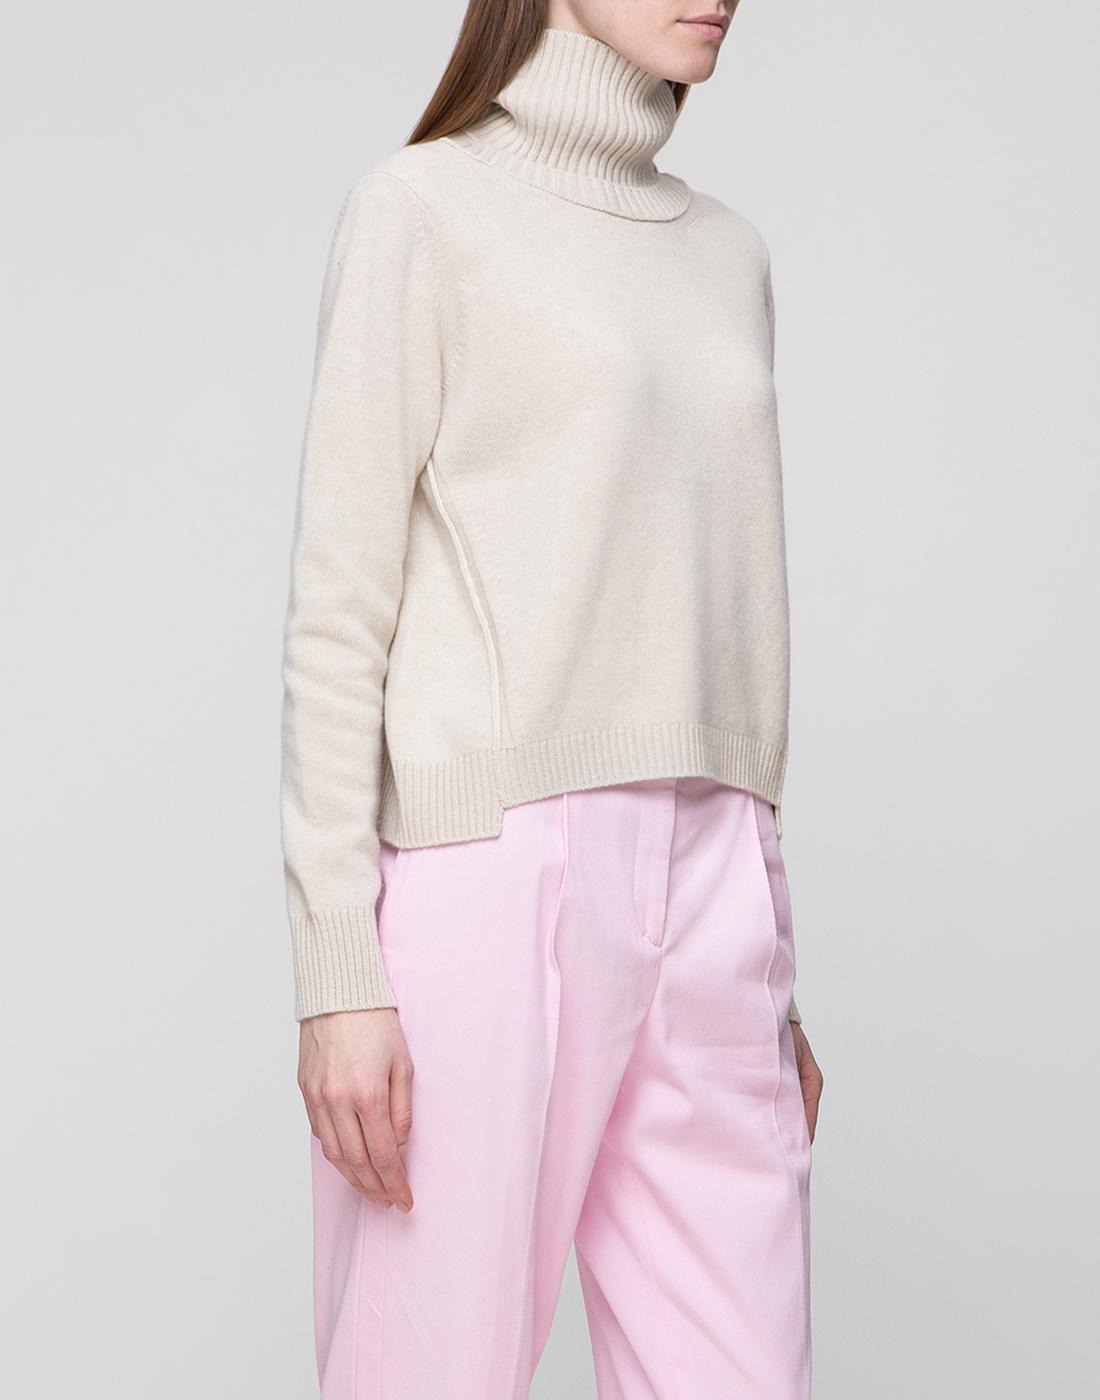 Женские розовые брюки Dorothee Schumacher S640403/421-3